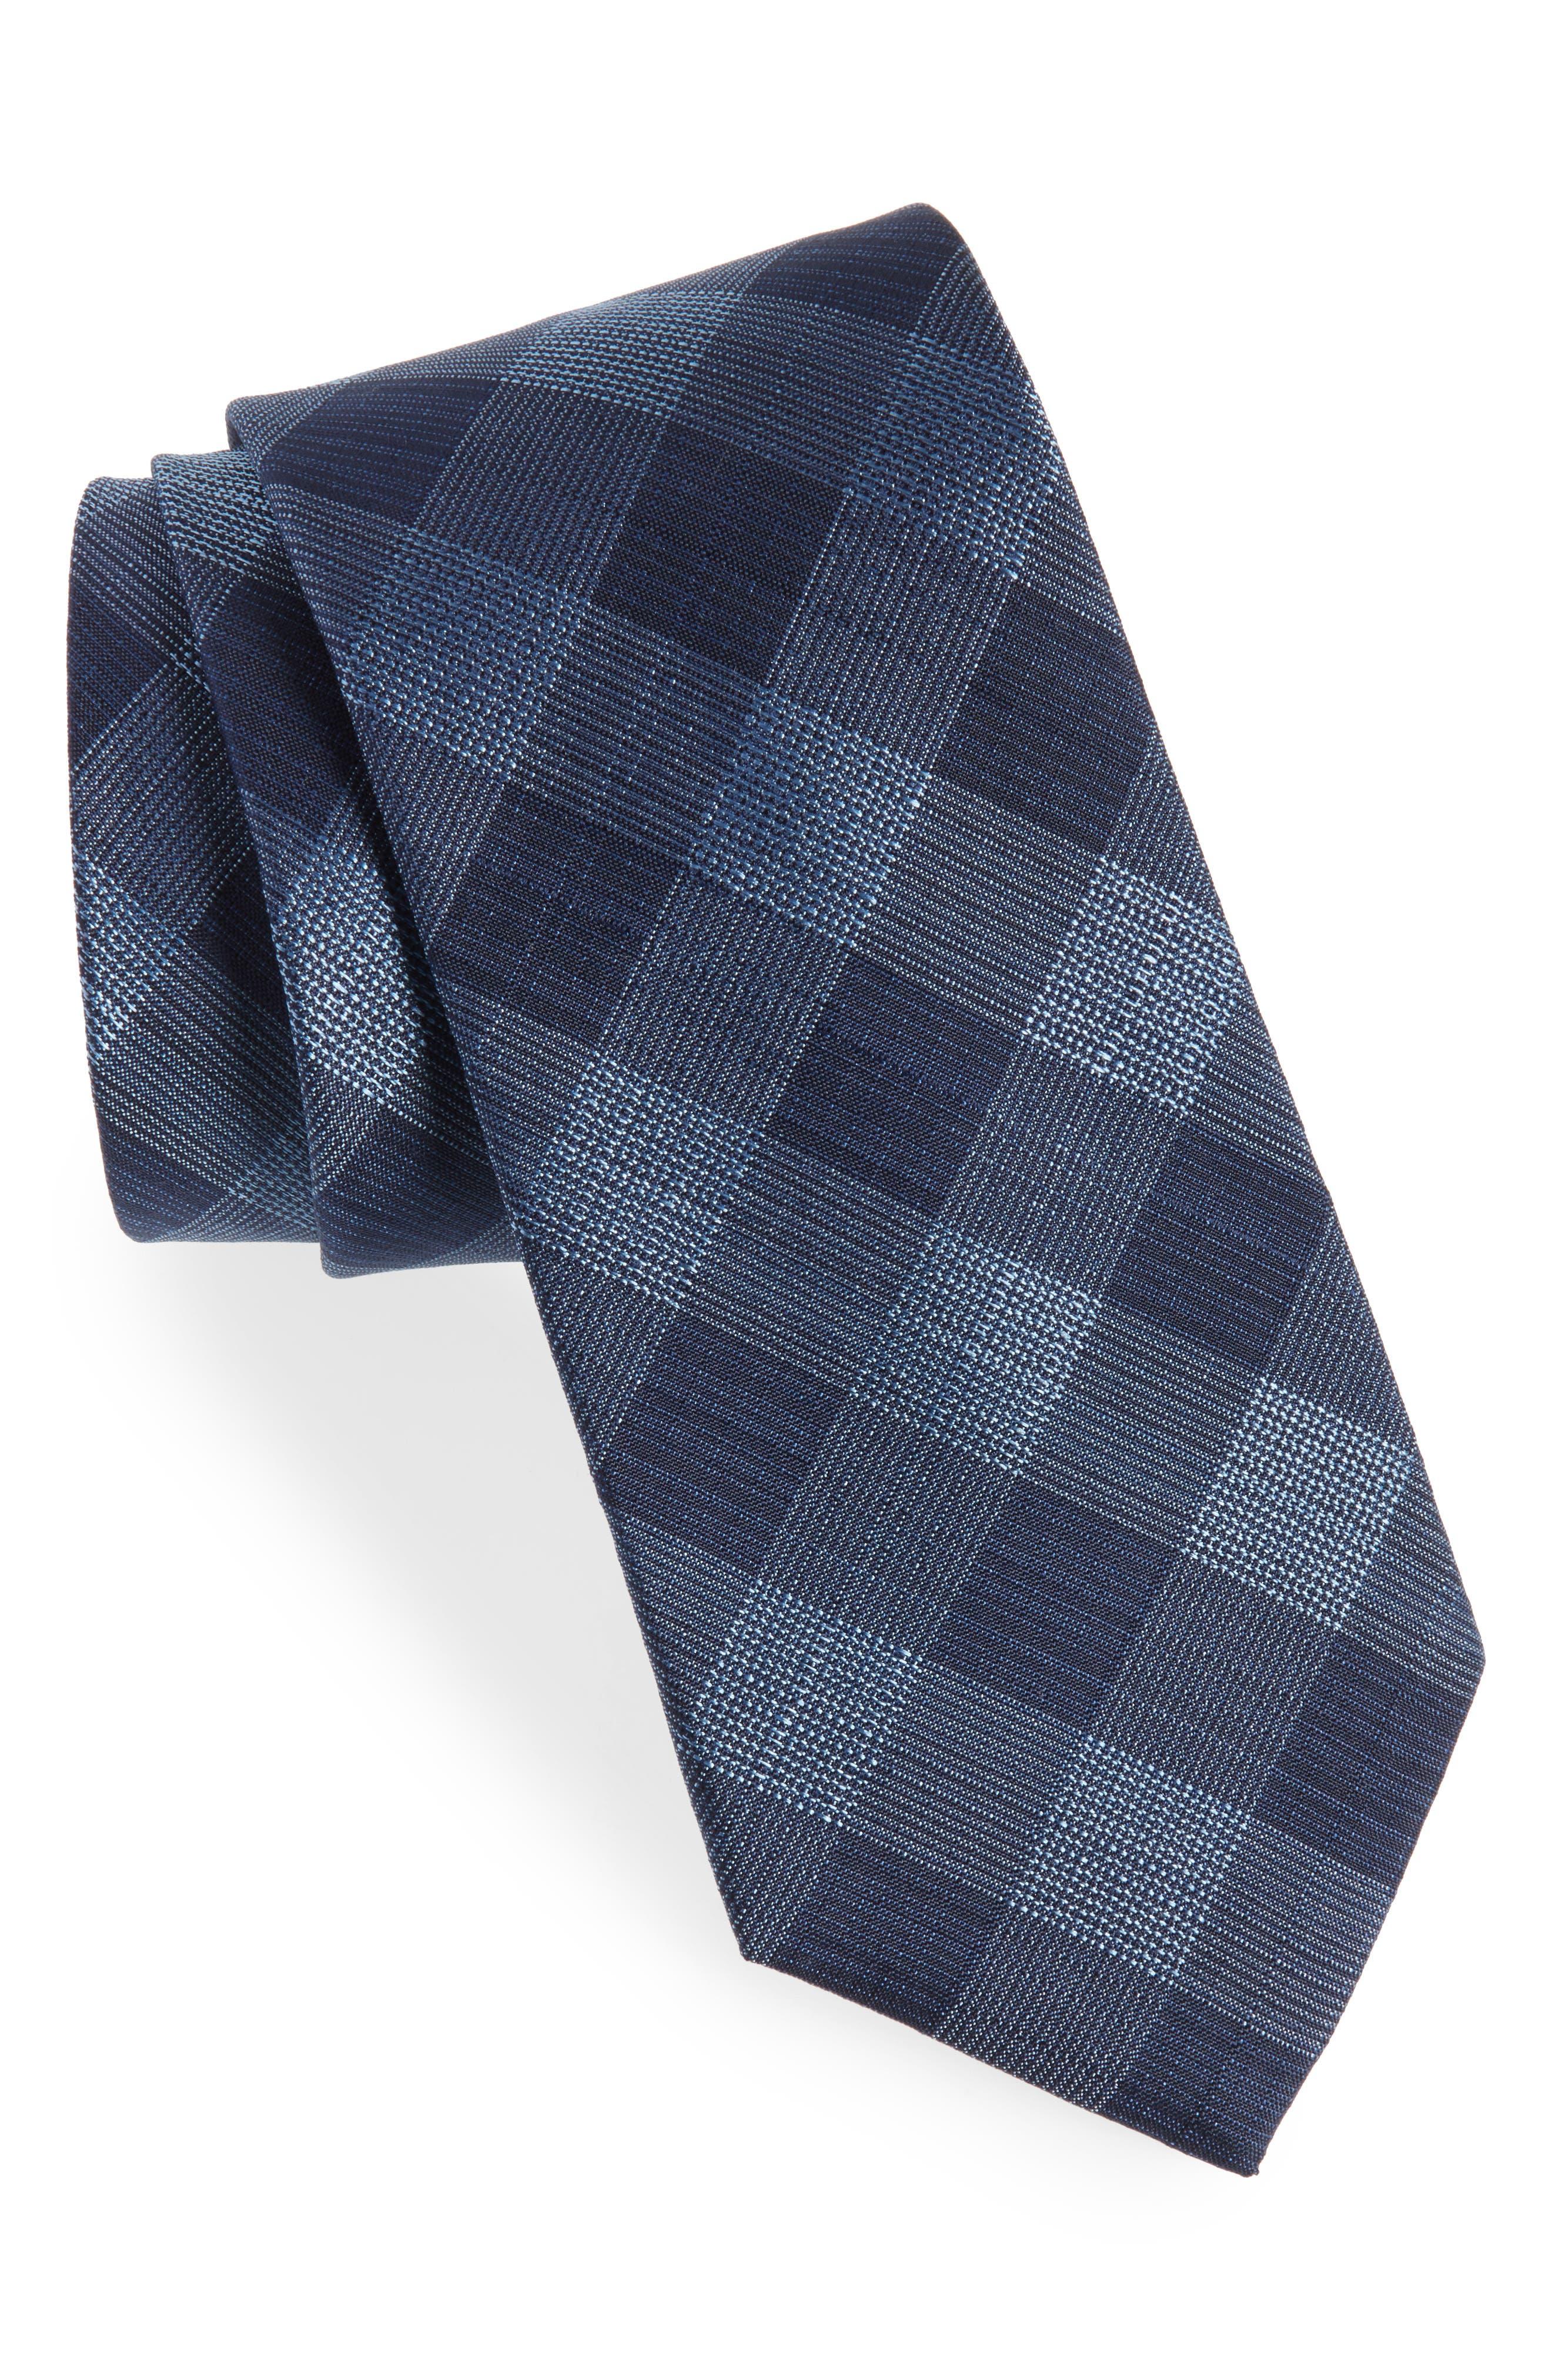 Raymer Check Silk Tie,                         Main,                         color, Navy